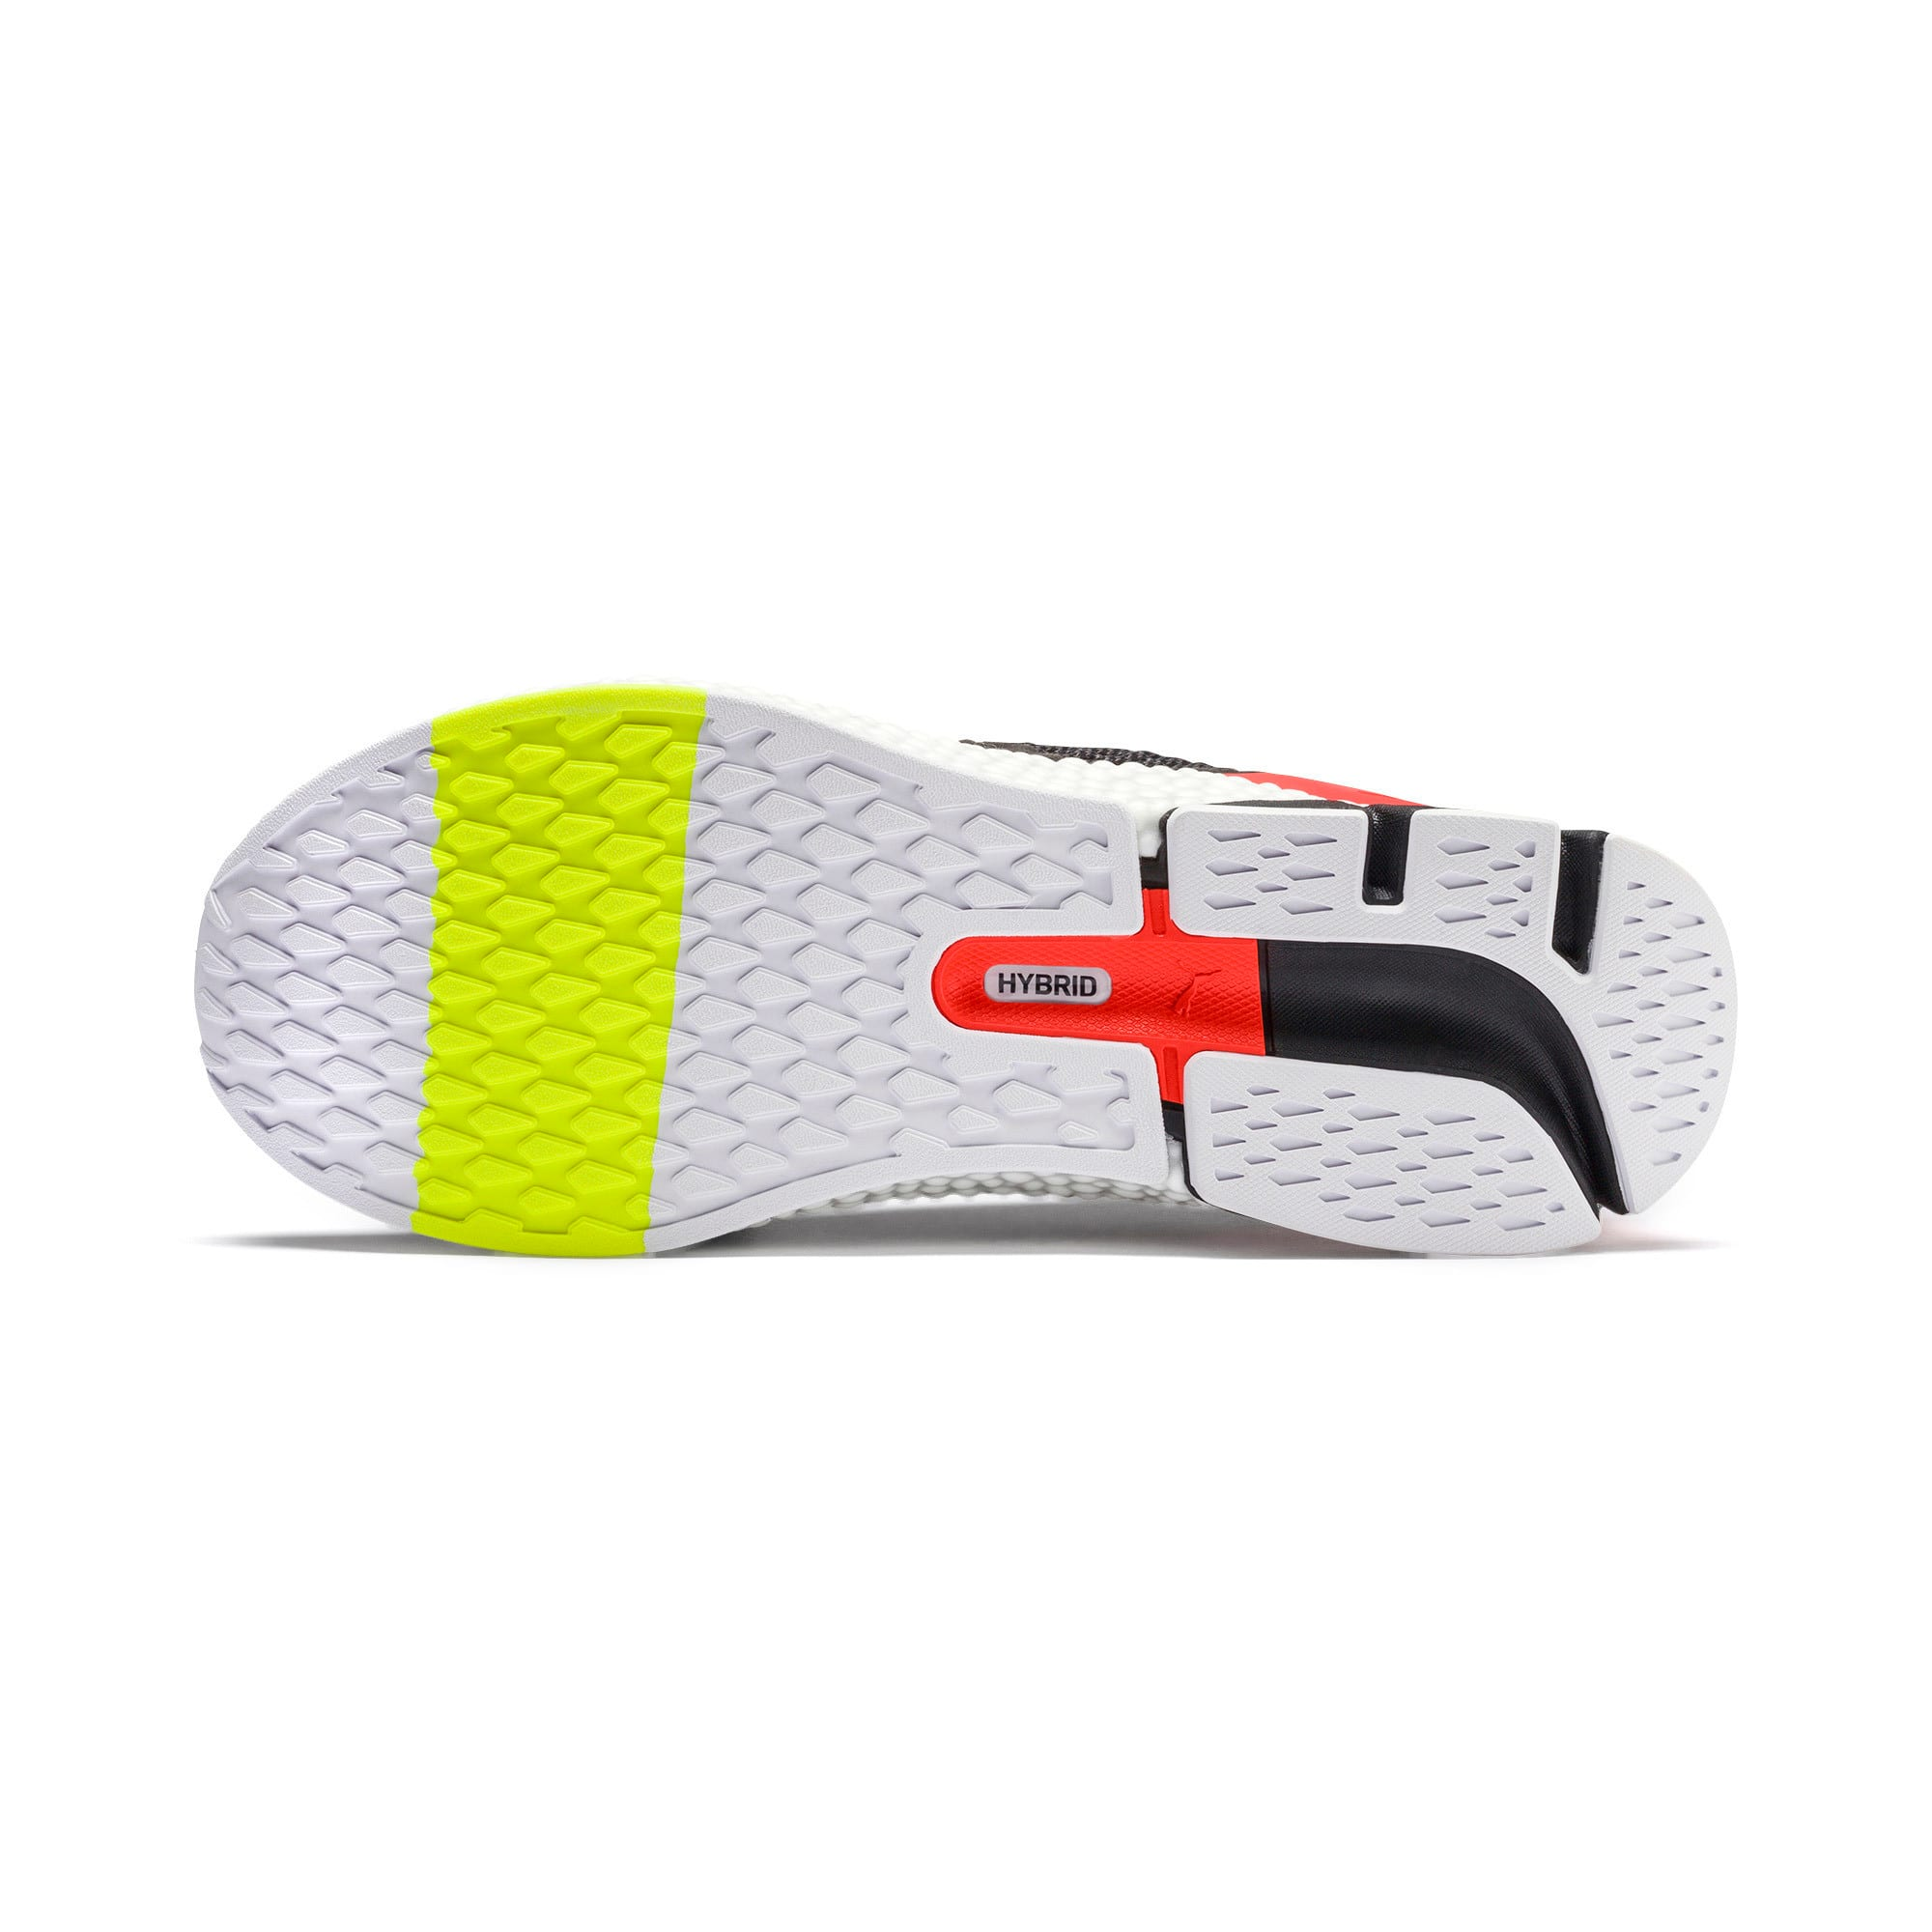 Thumbnail 5 of HYBRID Astro Men's Running Shoes, CASTLEROCK-Puma Blck-Ngy Red, medium